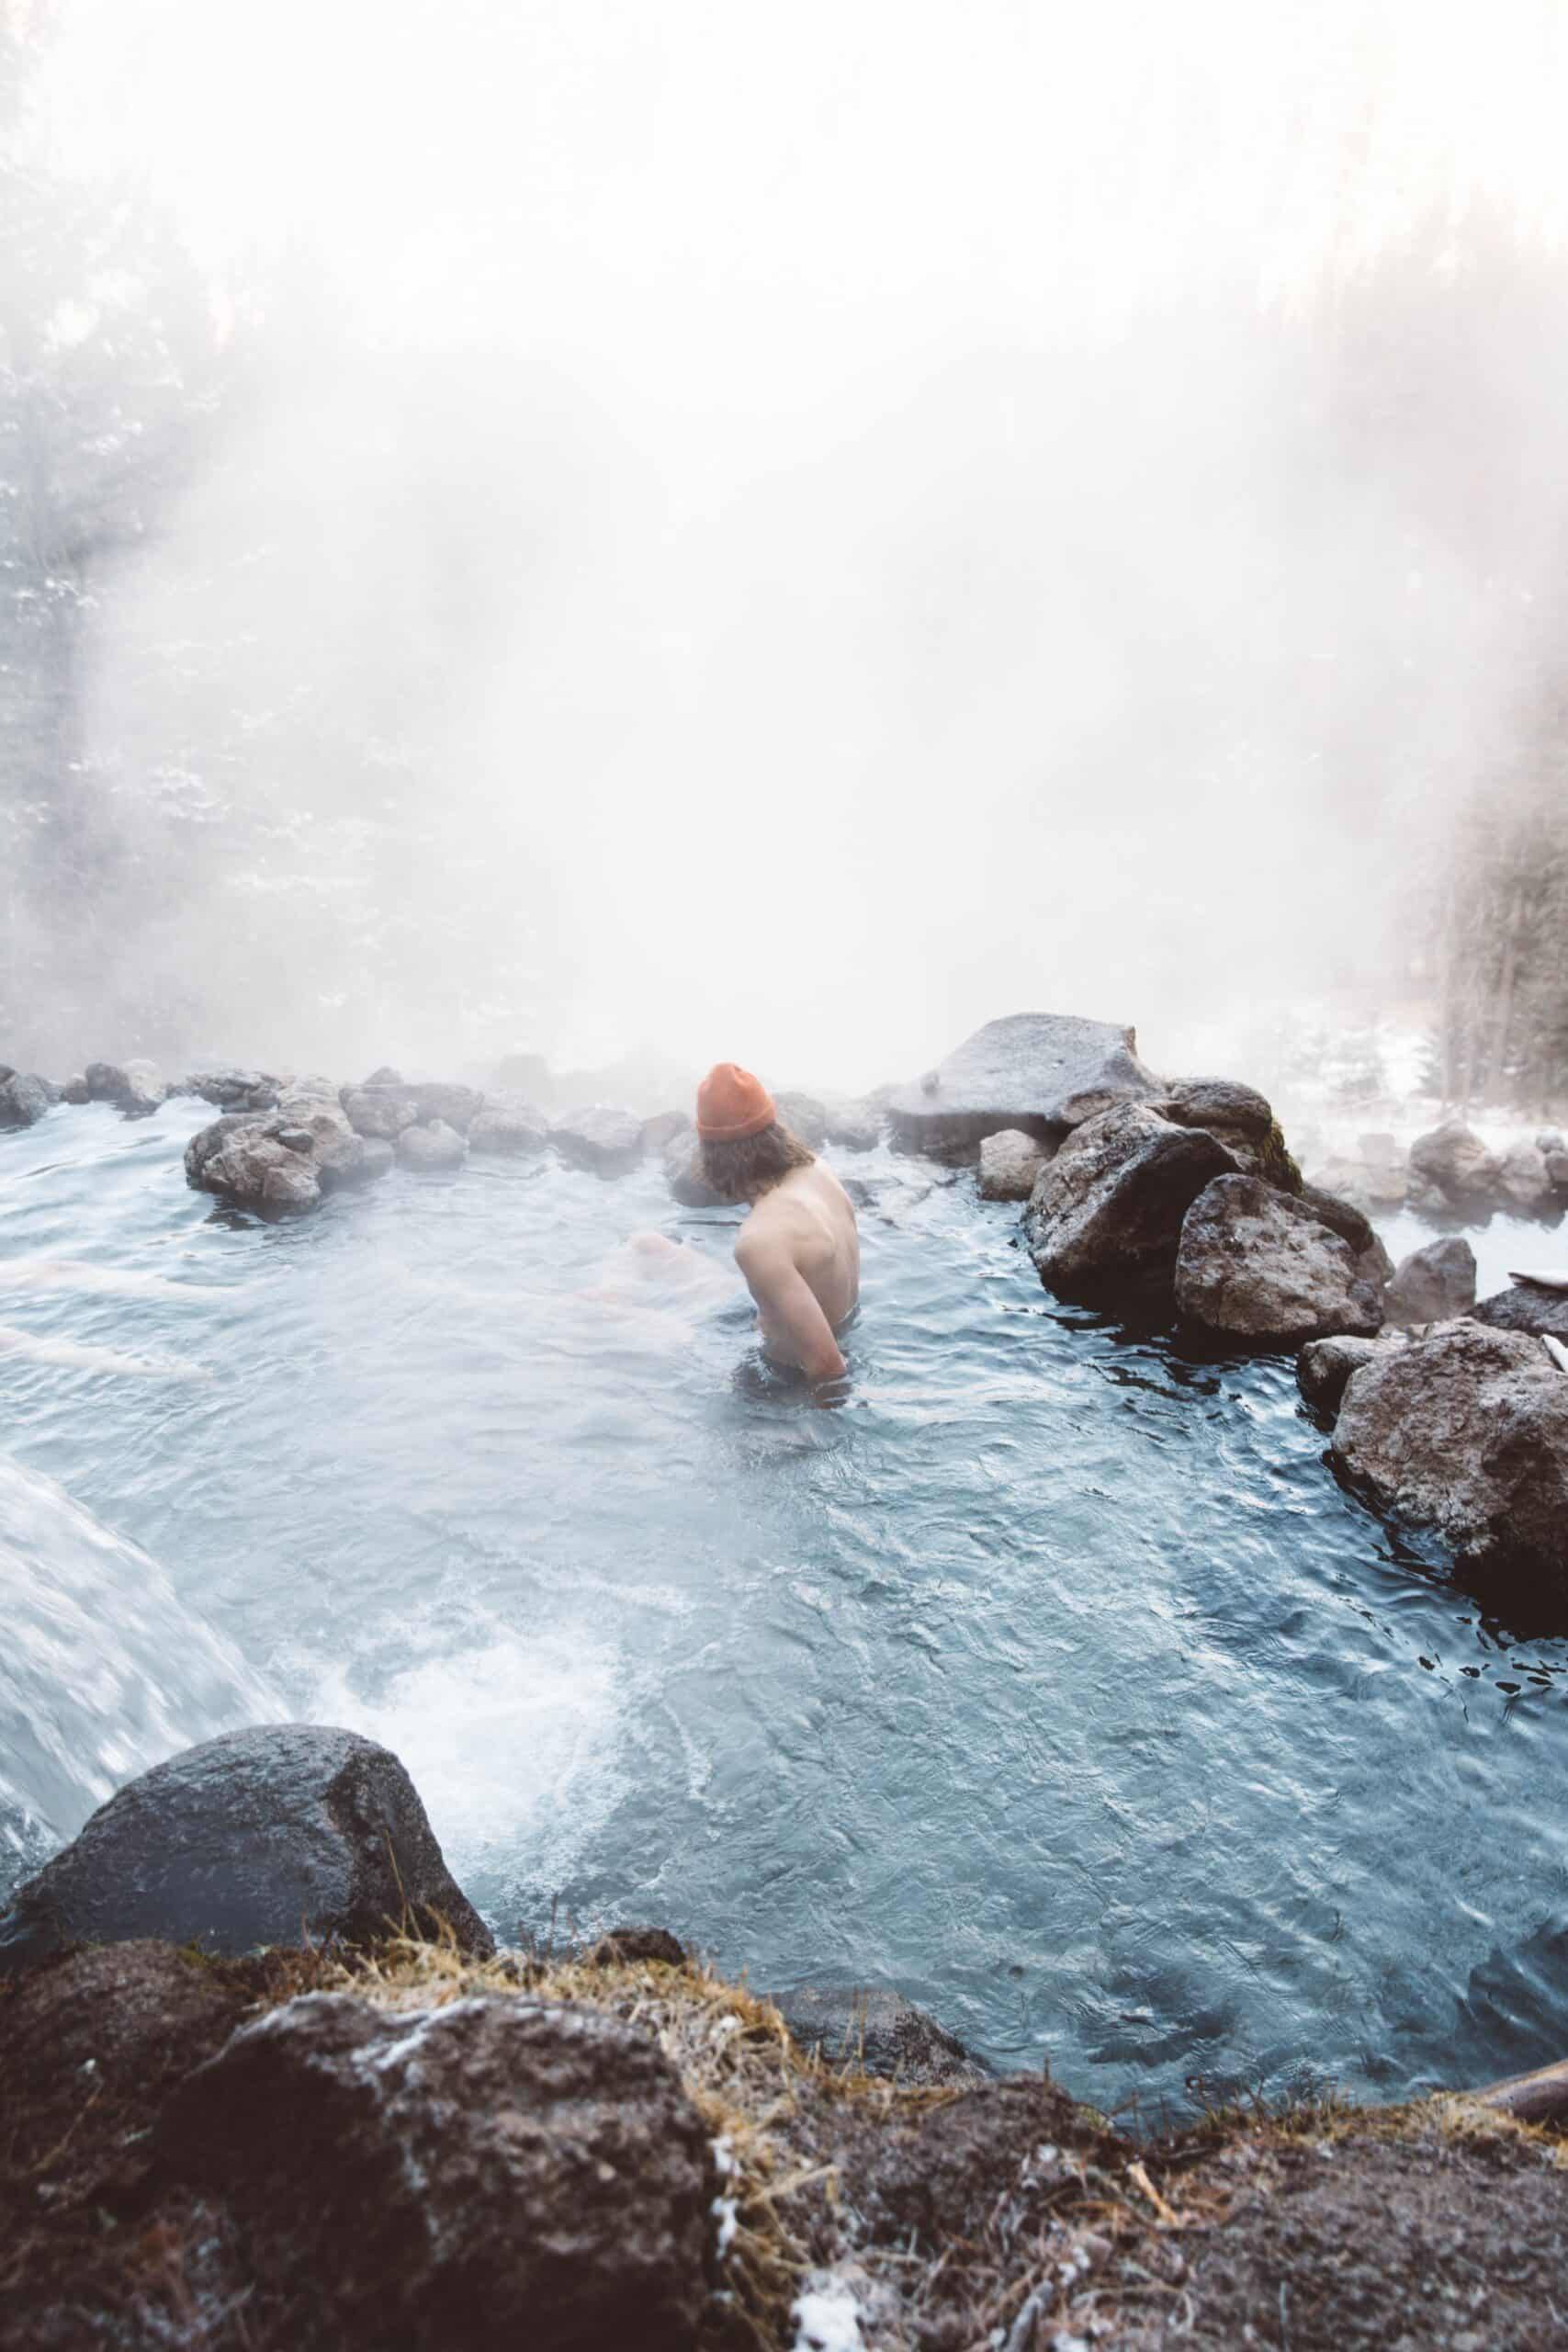 man in hot springs in the winter